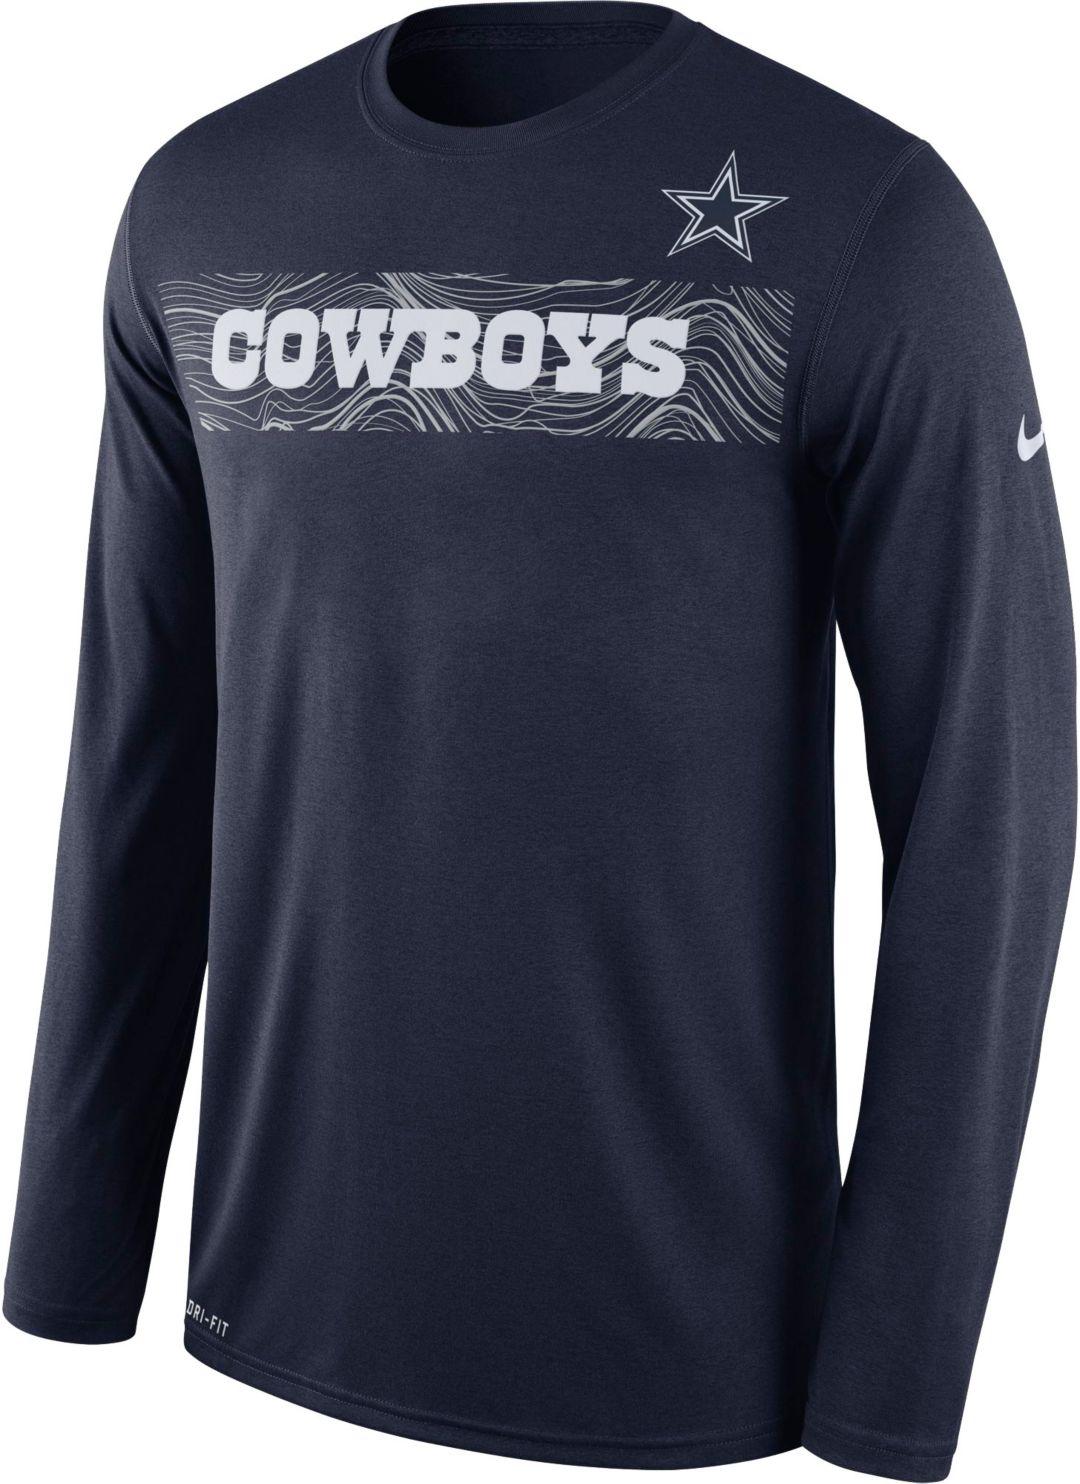 1355bb36fc6fa Nike Men's Dallas Cowboys Sideline Seismic Legend Performance Navy Long  Sleeve Shirt